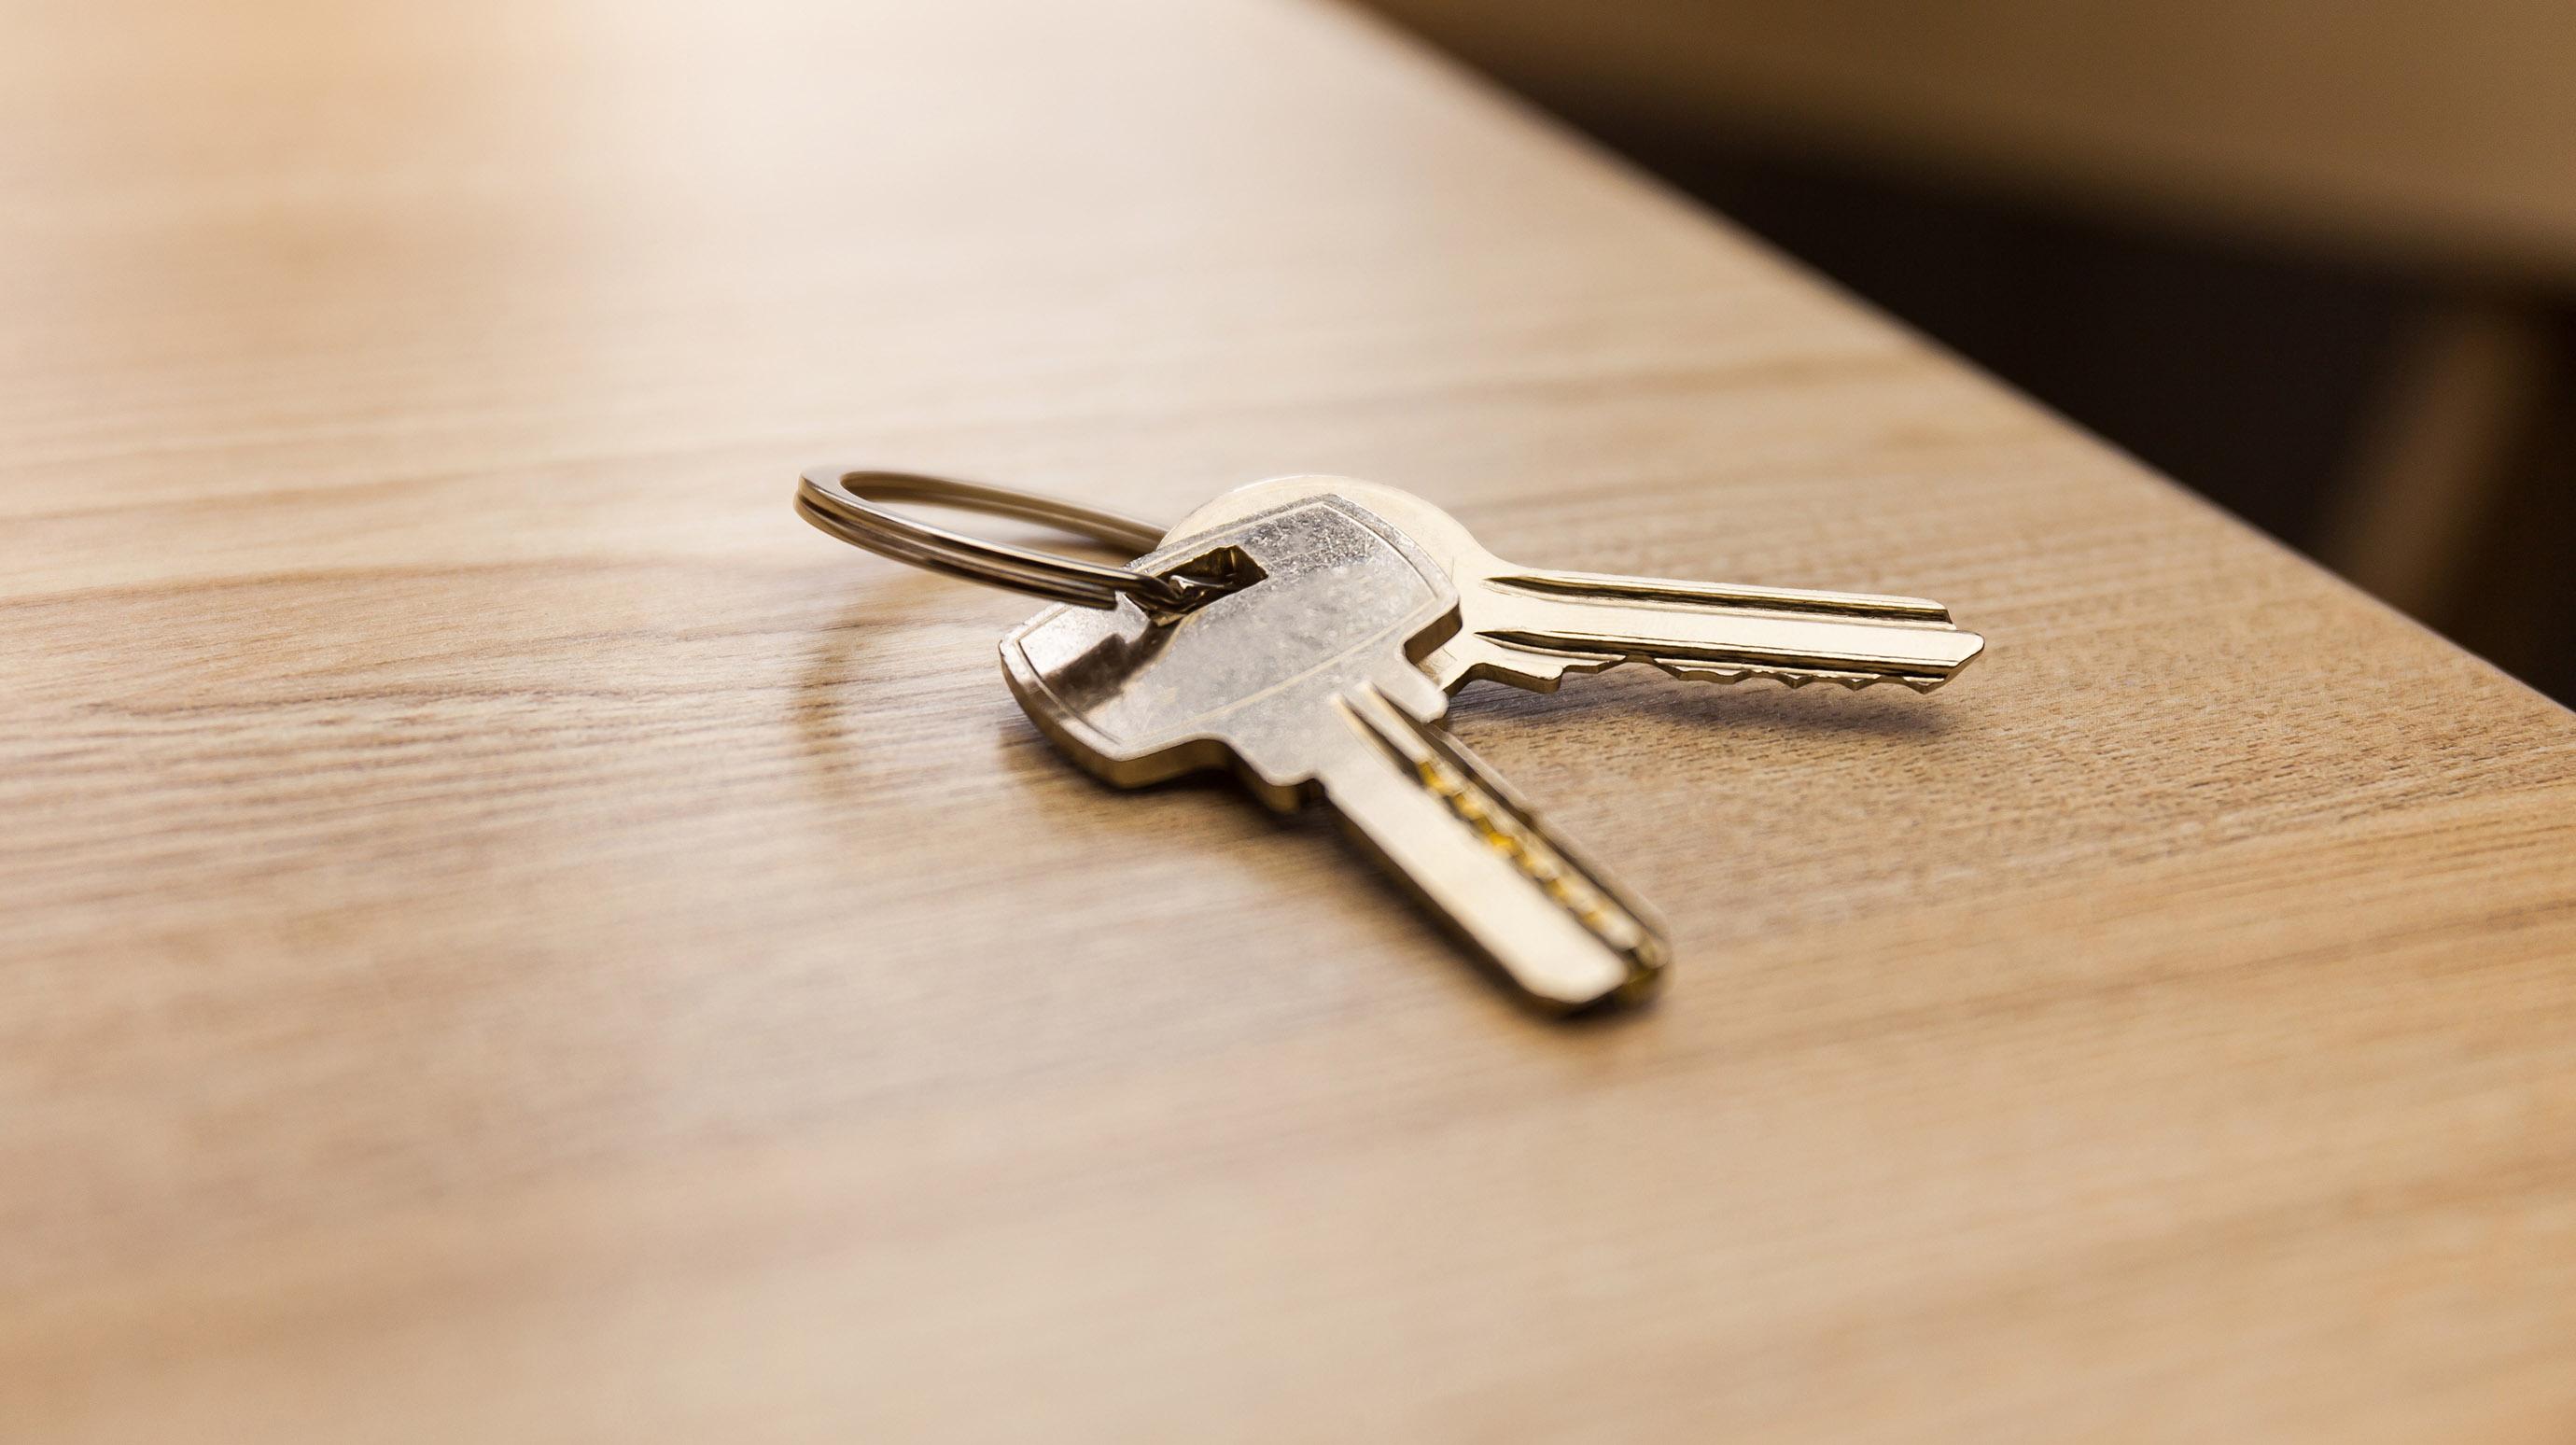 Illinois Rental Assistance Program - house keys on a table